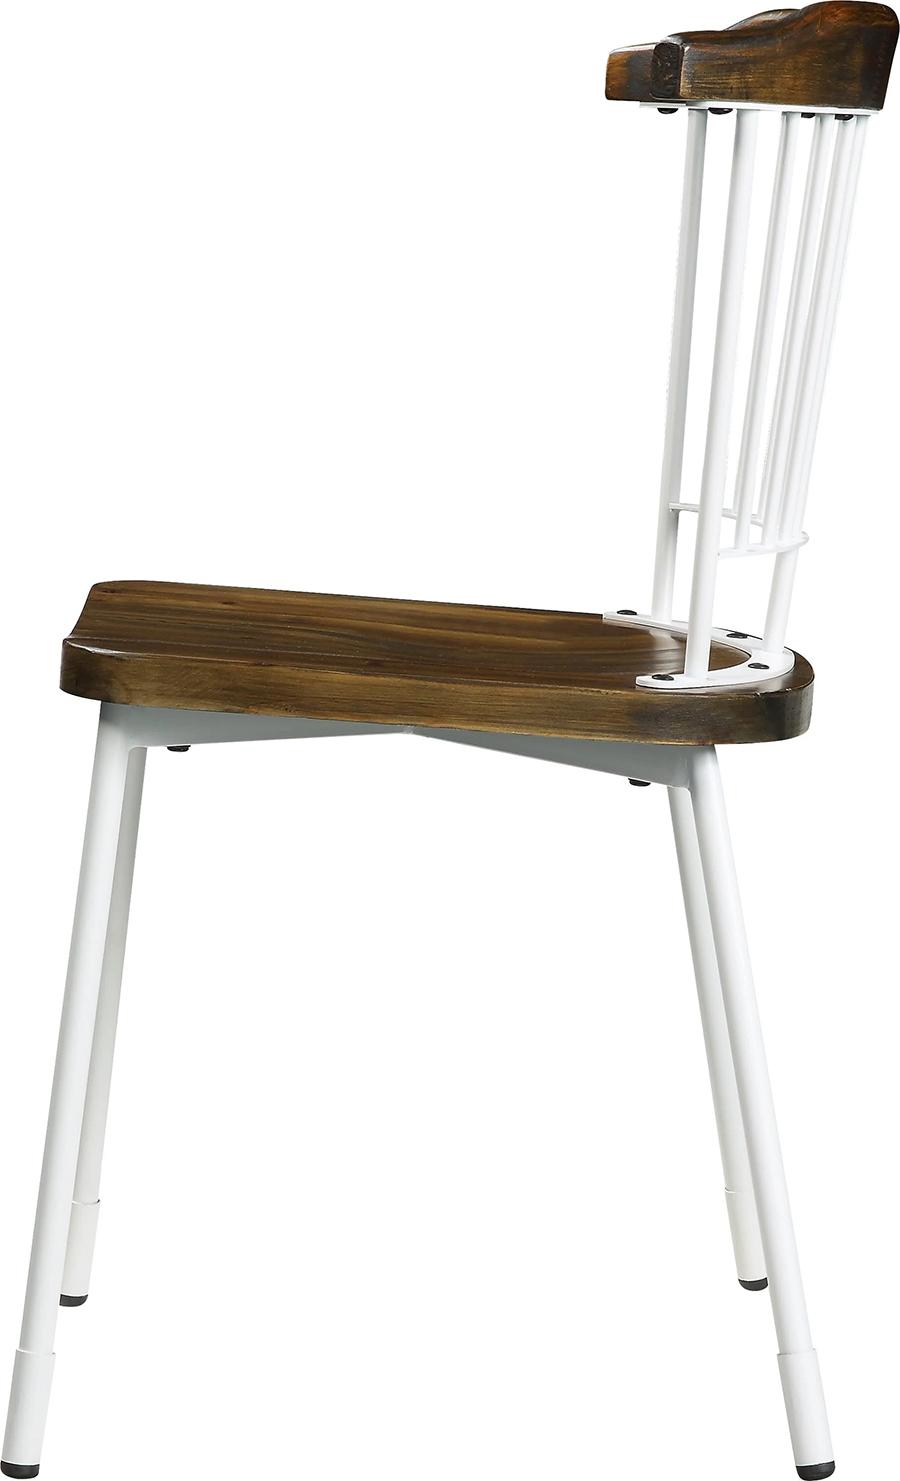 White & Brown Oak Side Chair Side View